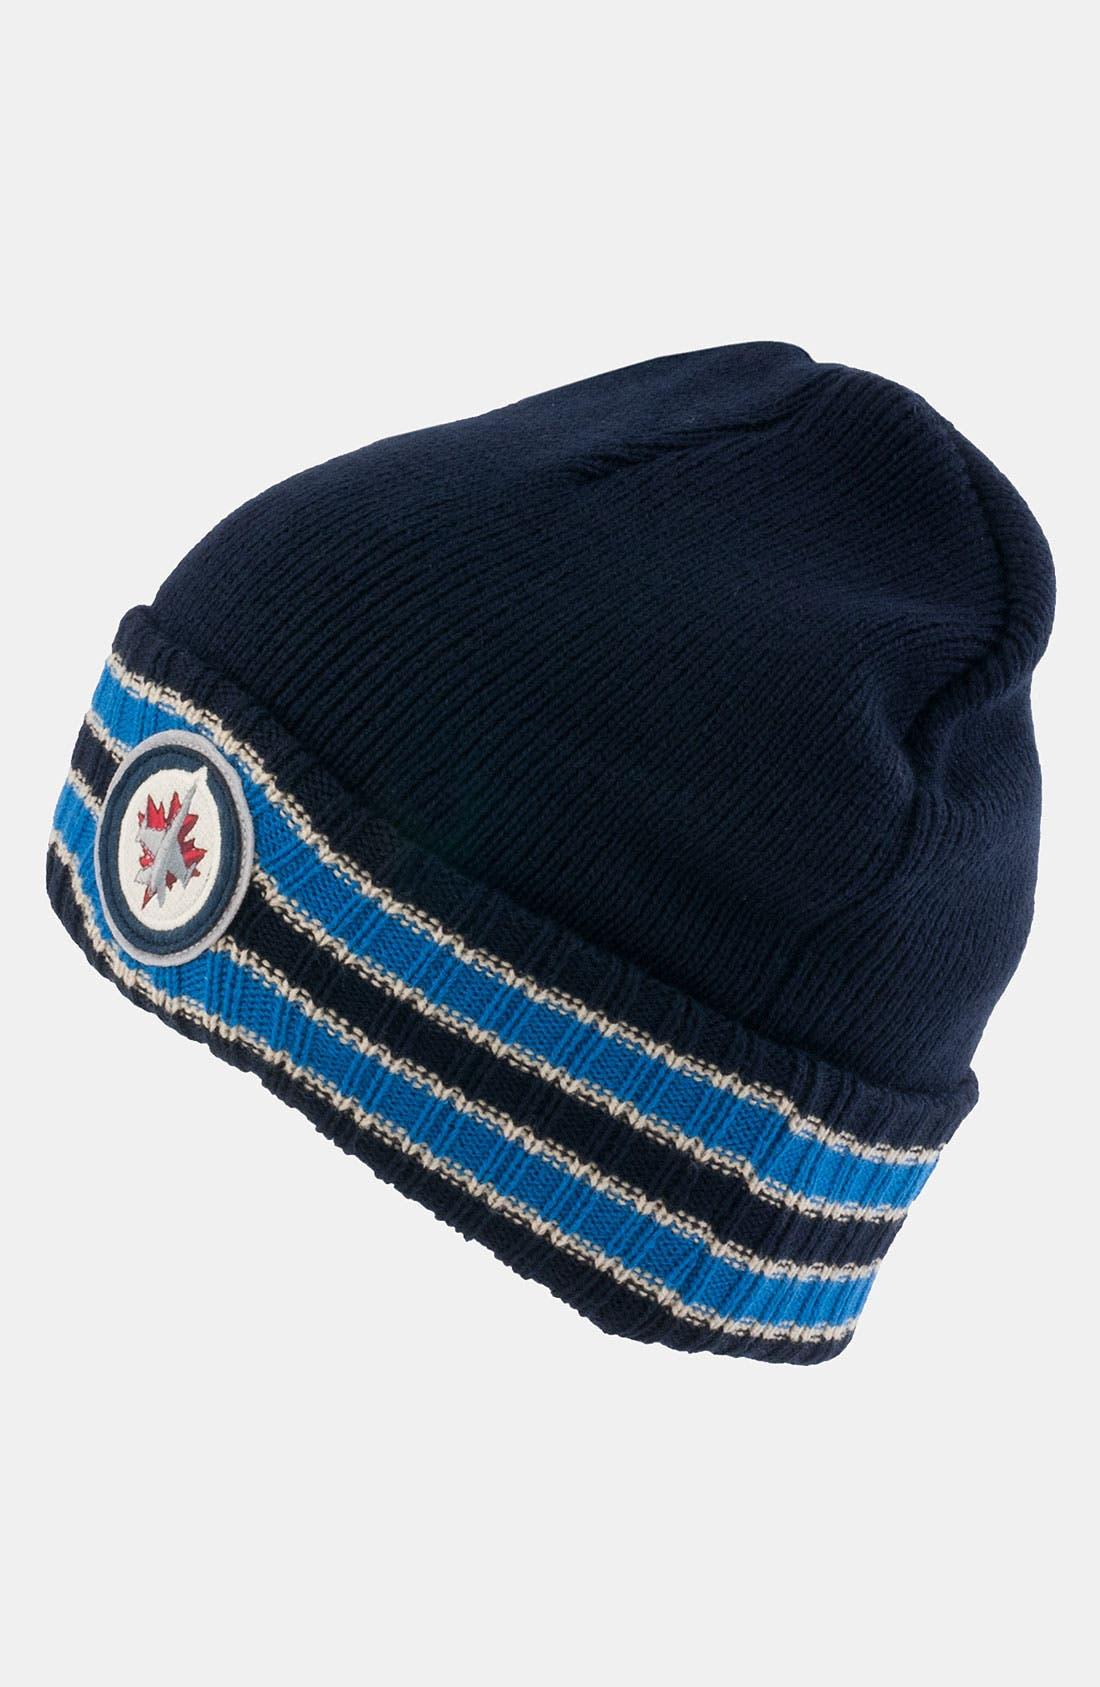 Main Image - American Needle 'Winnepeg Jets - Slash' Knit Hat